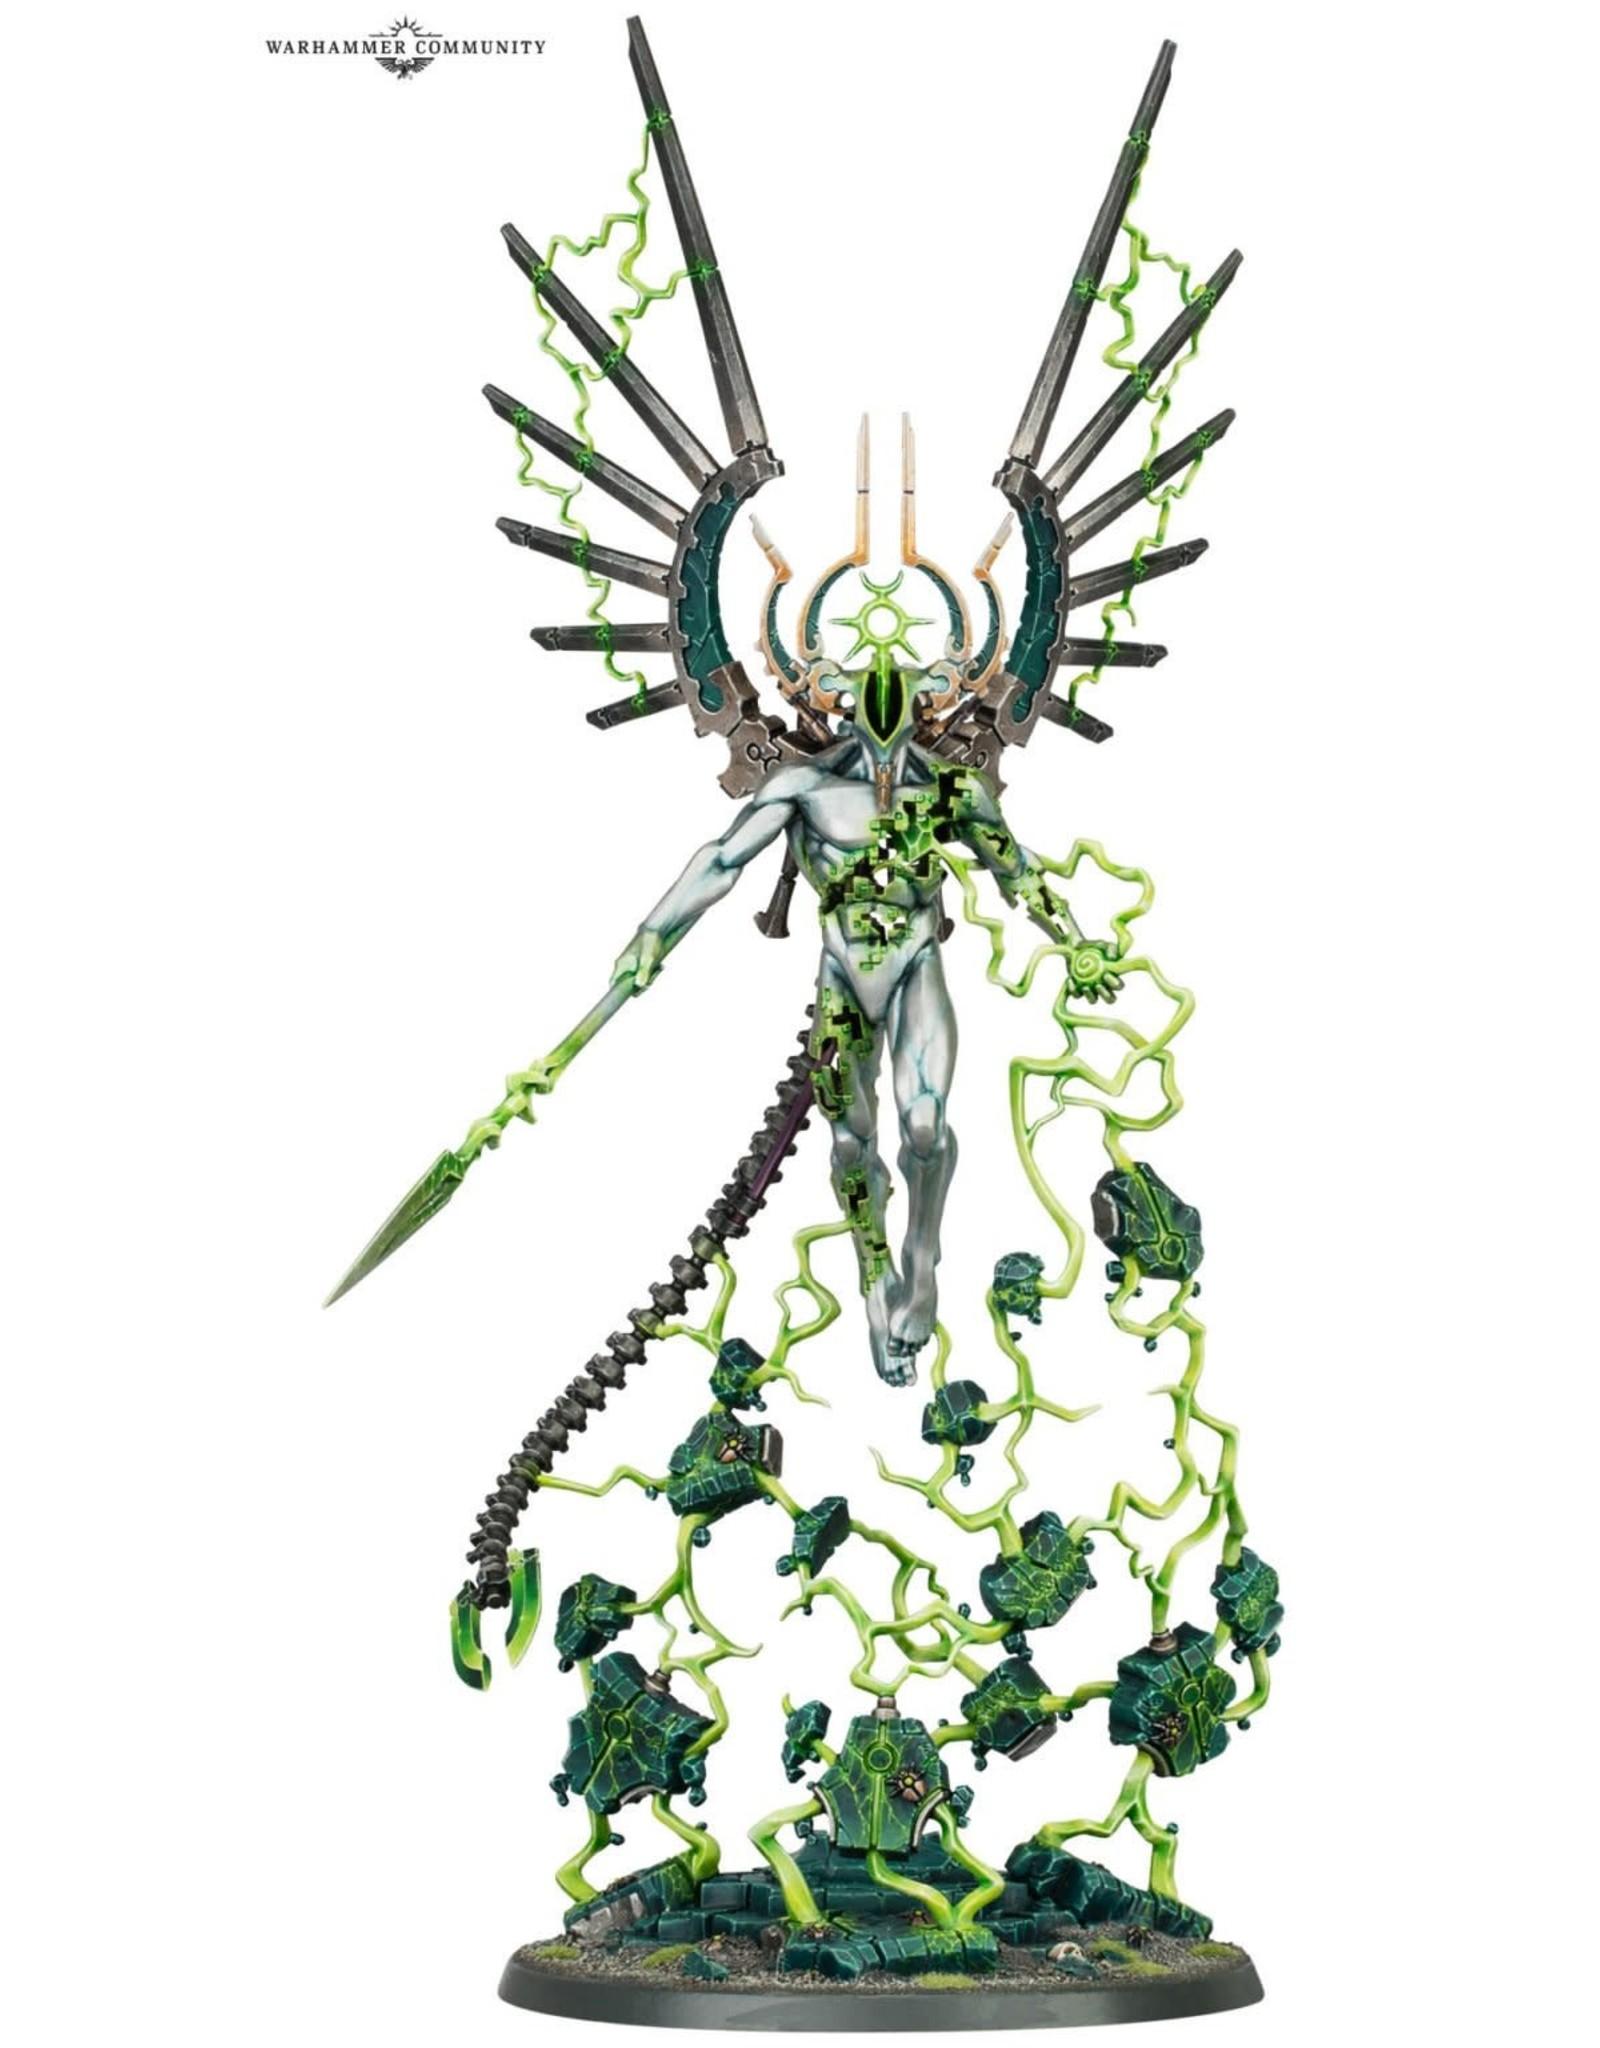 Warhammer 40k NECRONS: C'TAN SHARD OF THE VOID DRAGON *DATE DE SORTIE 24 OCTOBRE*